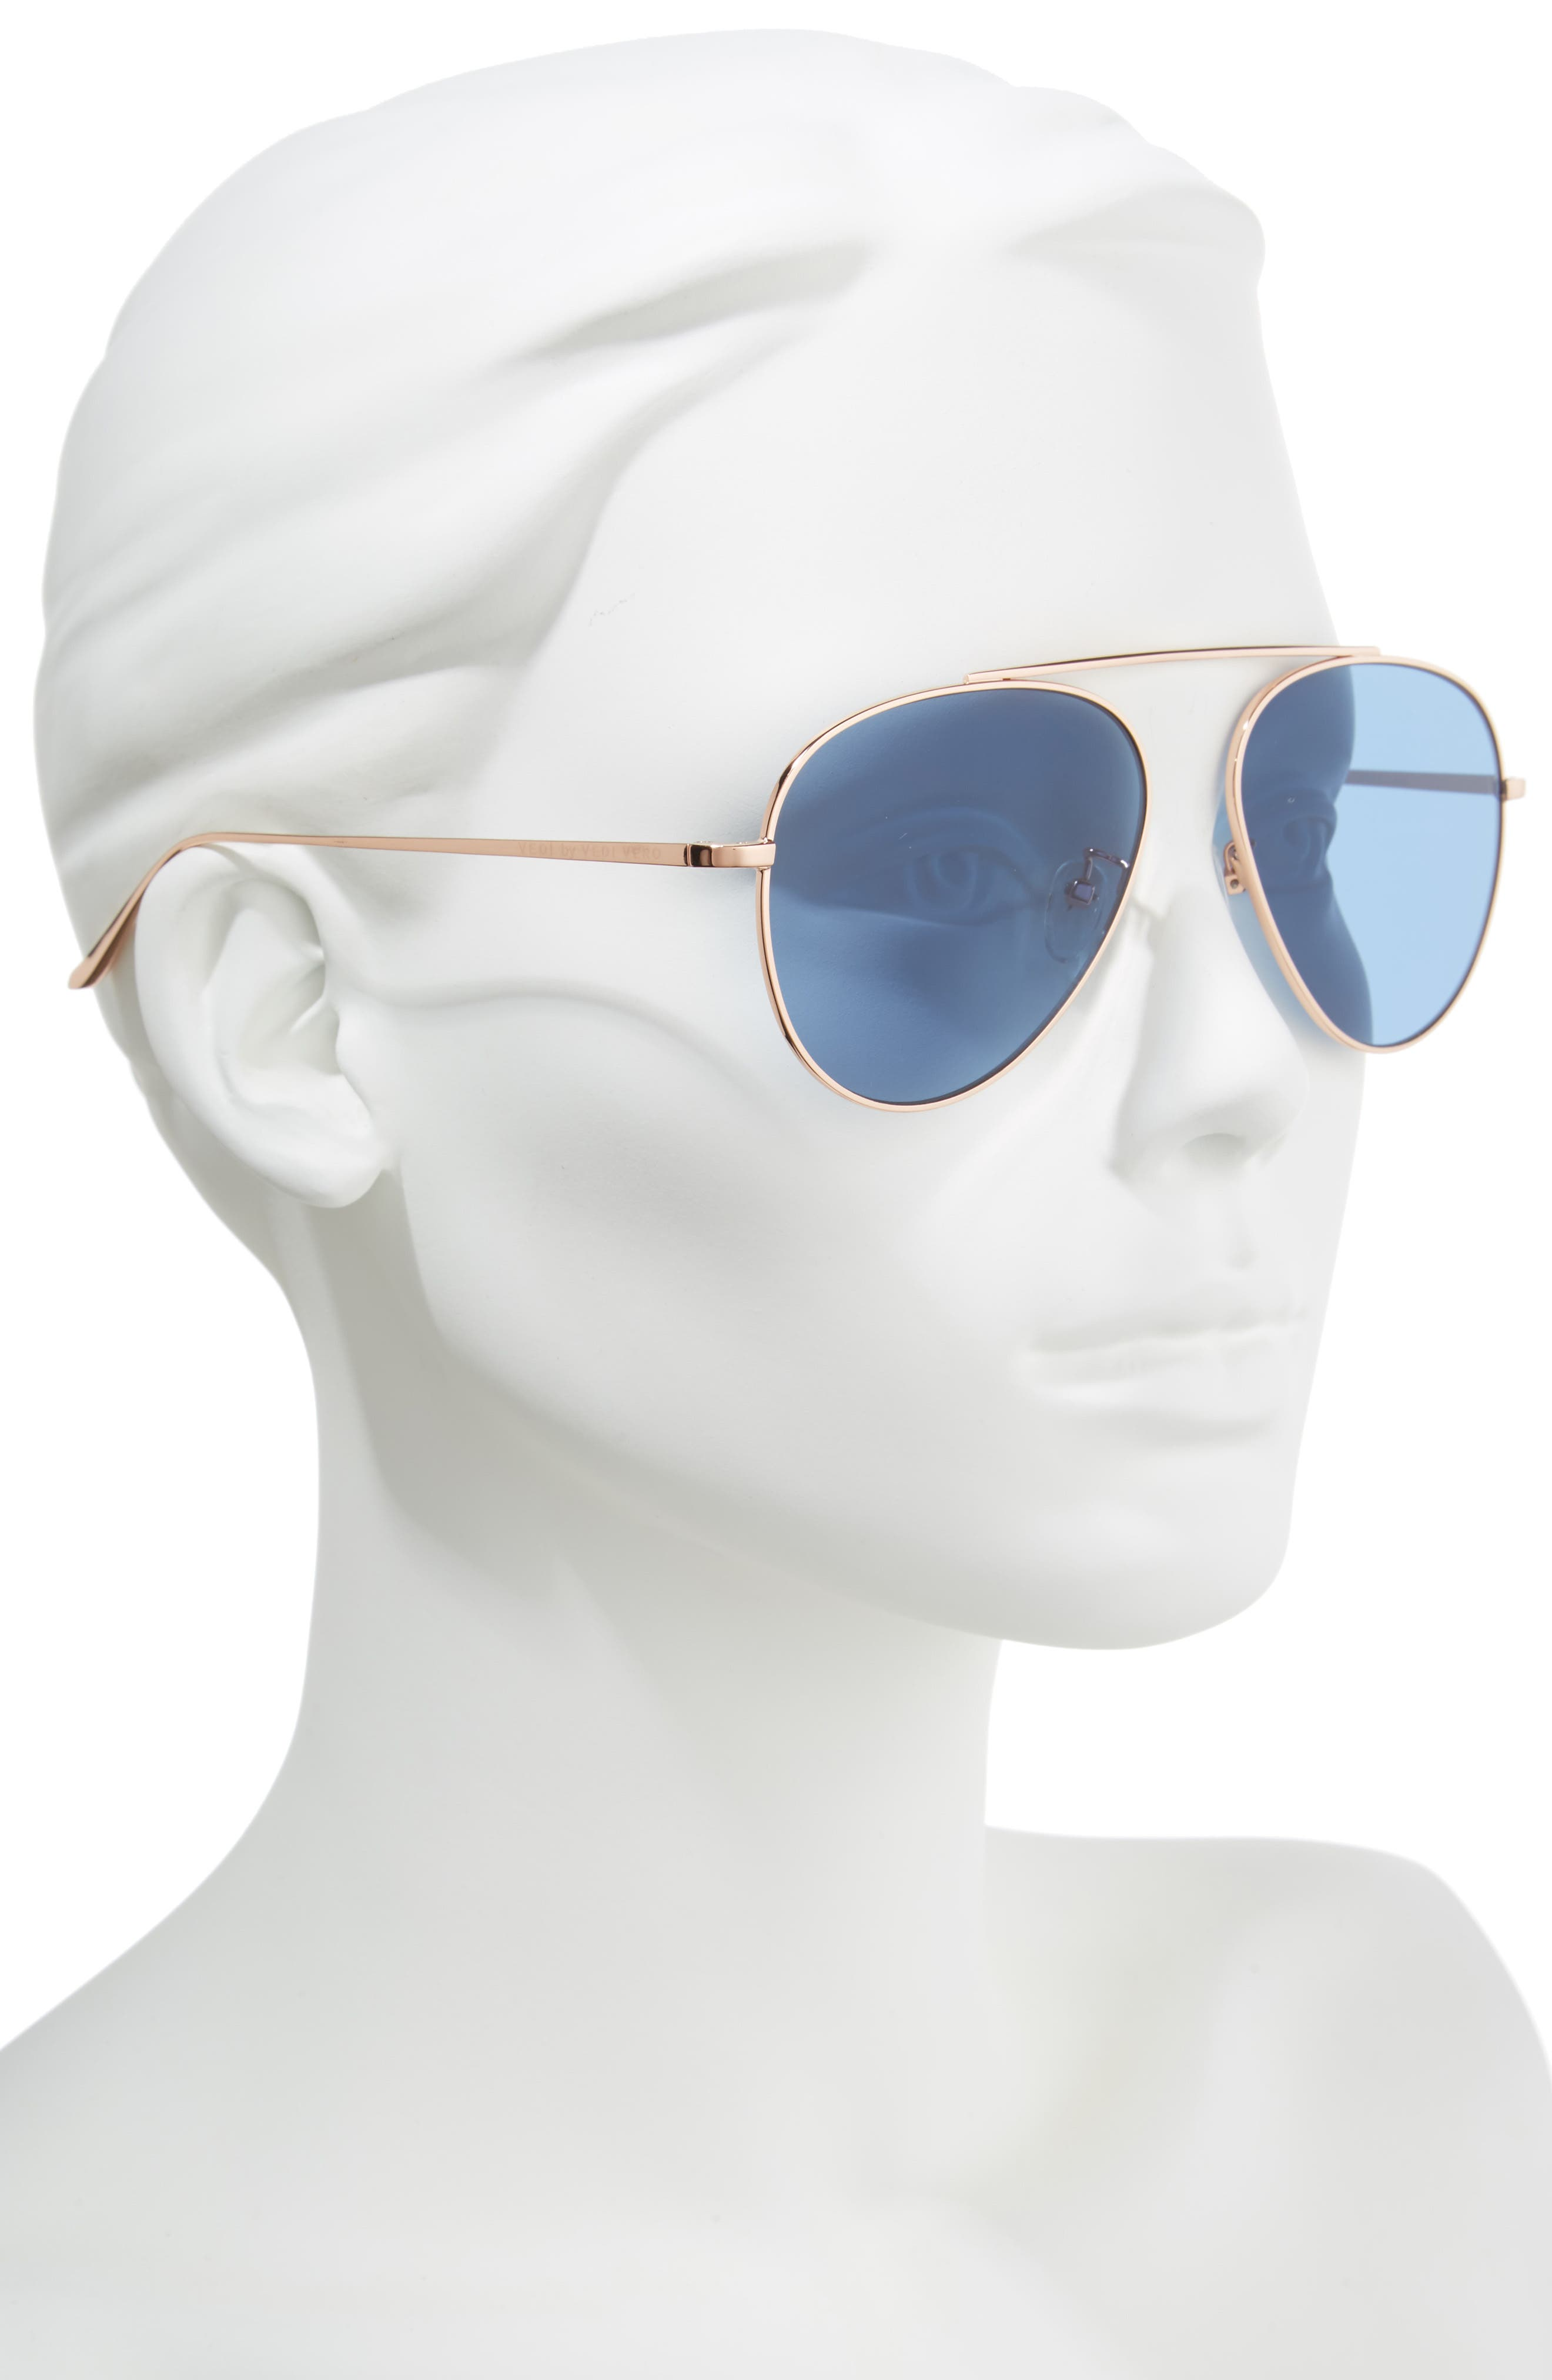 62mm Metal Oversize Aviator Sunglasses,                             Alternate thumbnail 2, color,                             ROSE GOLD/NAVY